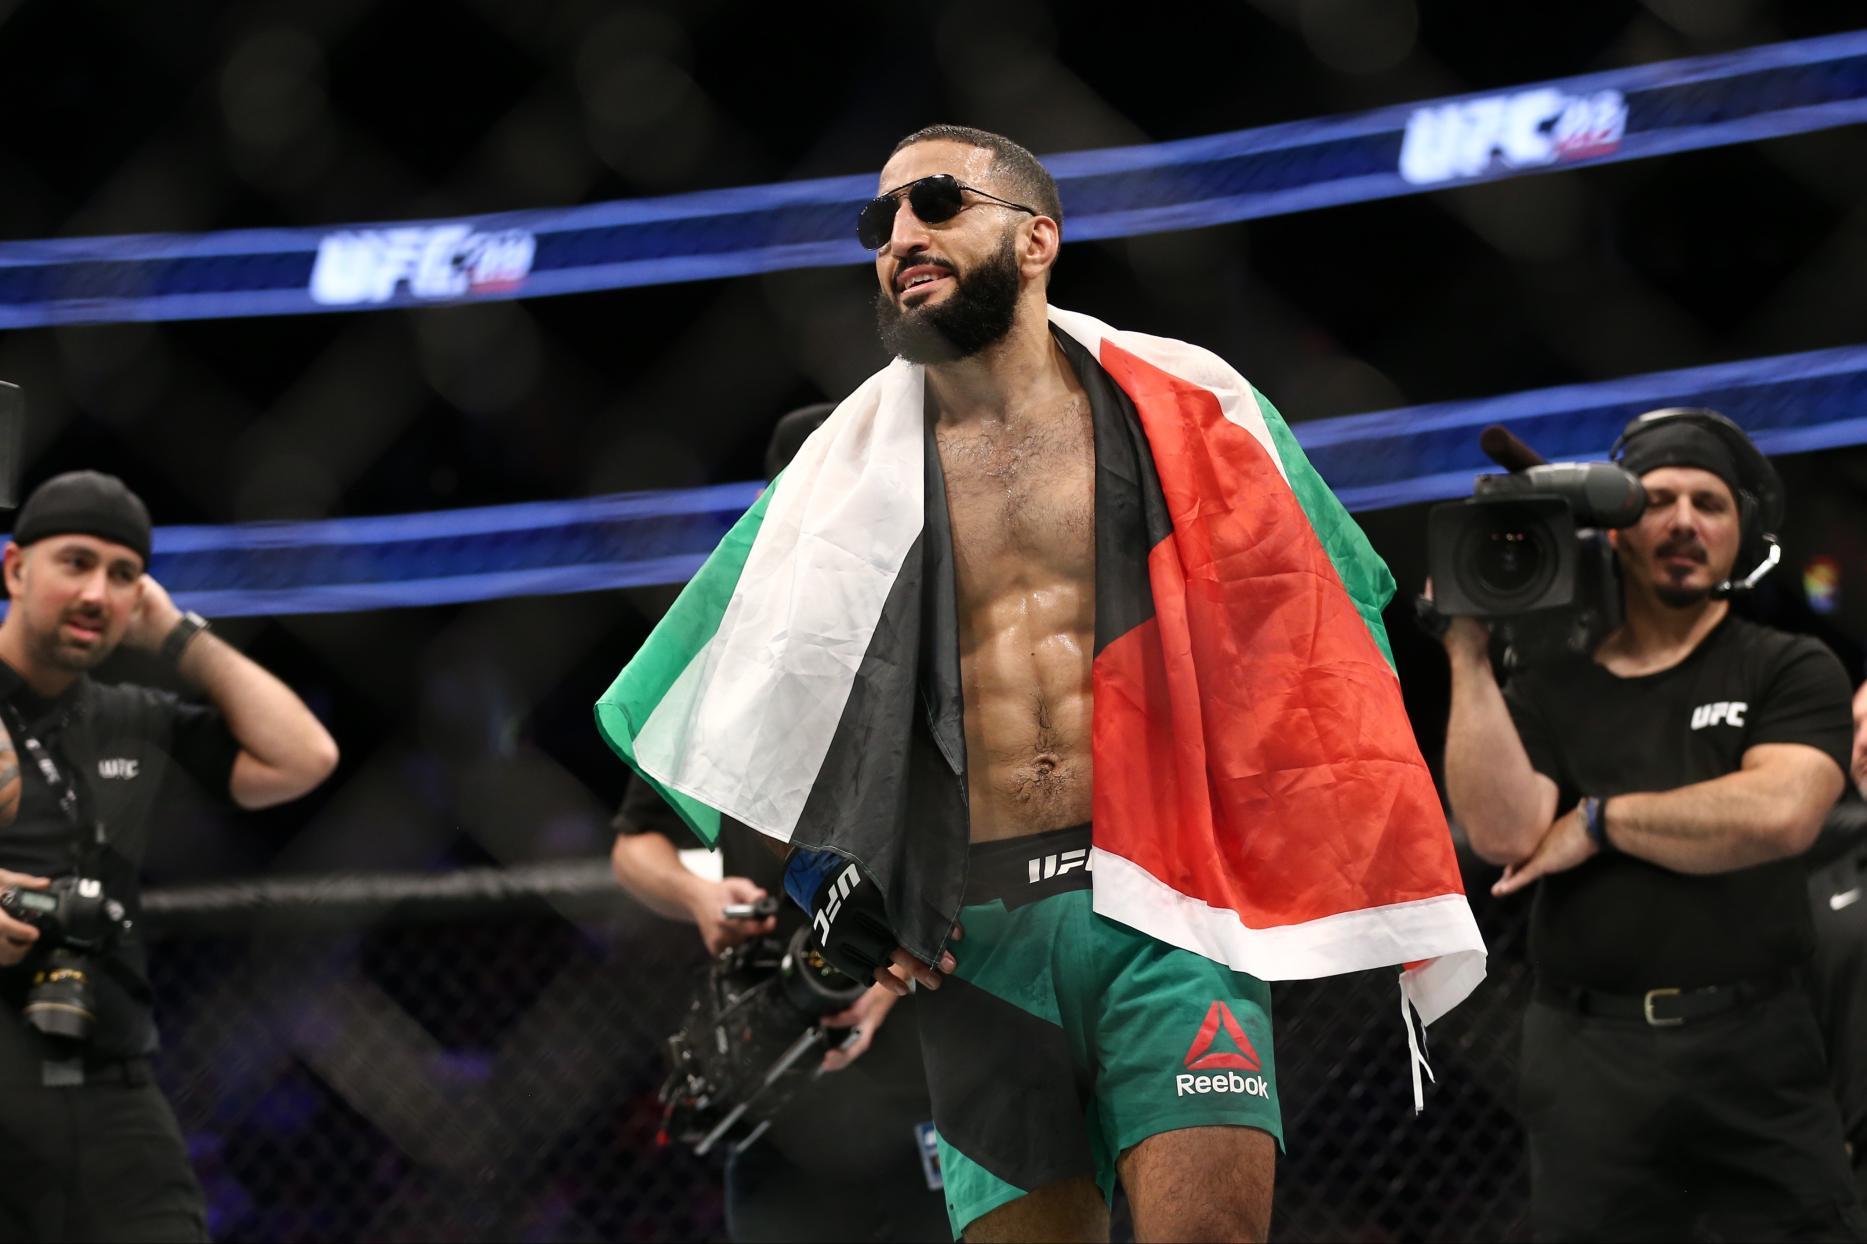 Petarung Palestina, Belal Muhammad Menang di UFC 236